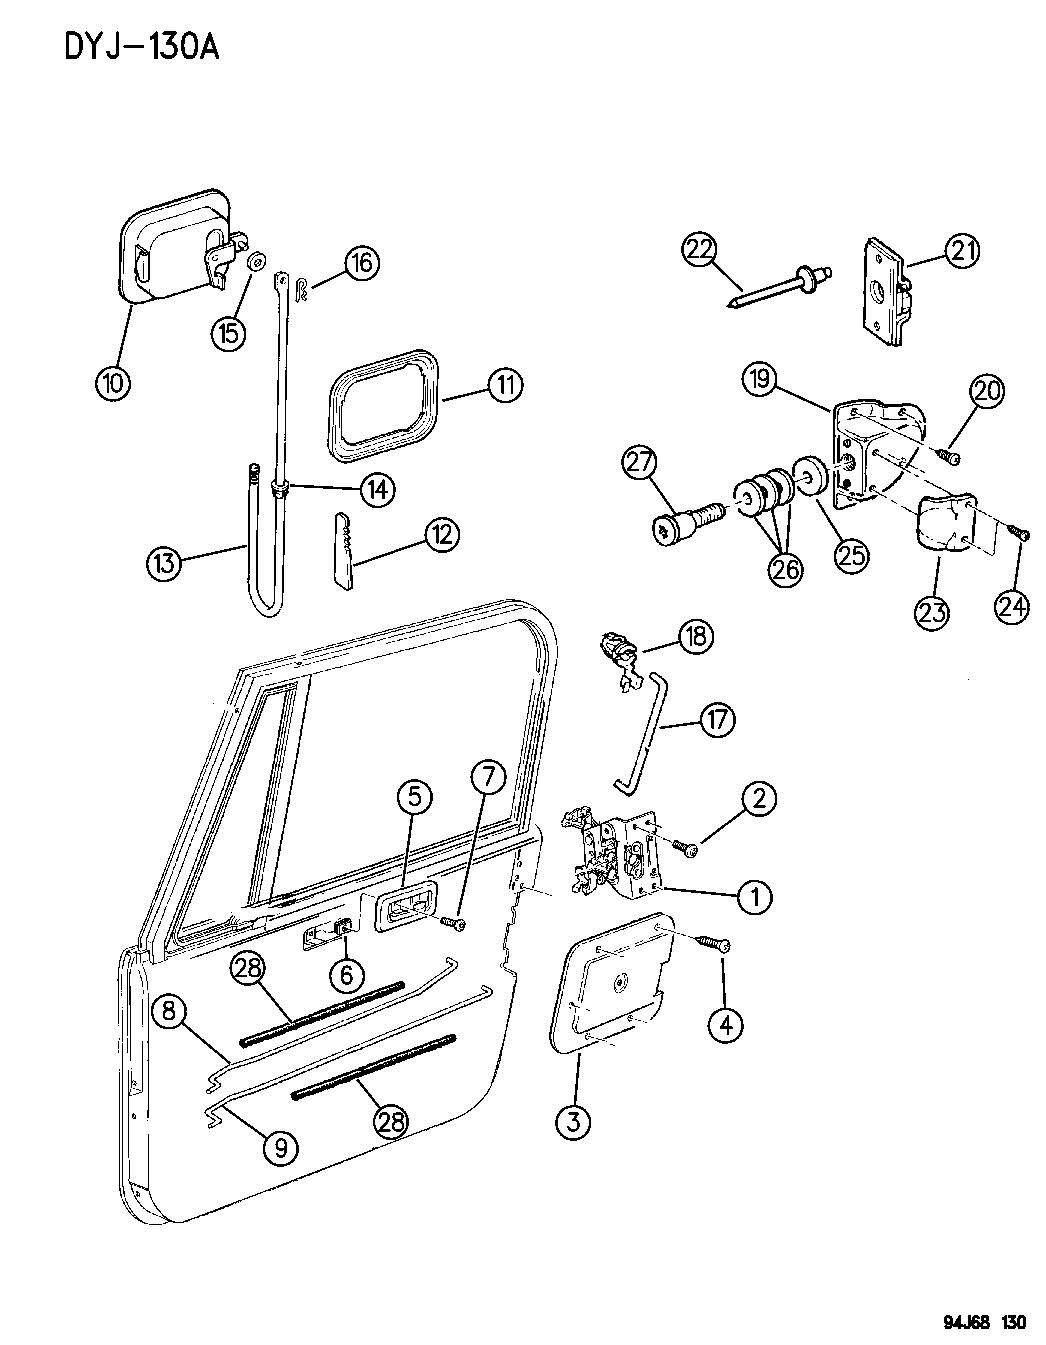 Wiring Diagram Info: 35 1997 Jeep Wrangler Parts Diagram